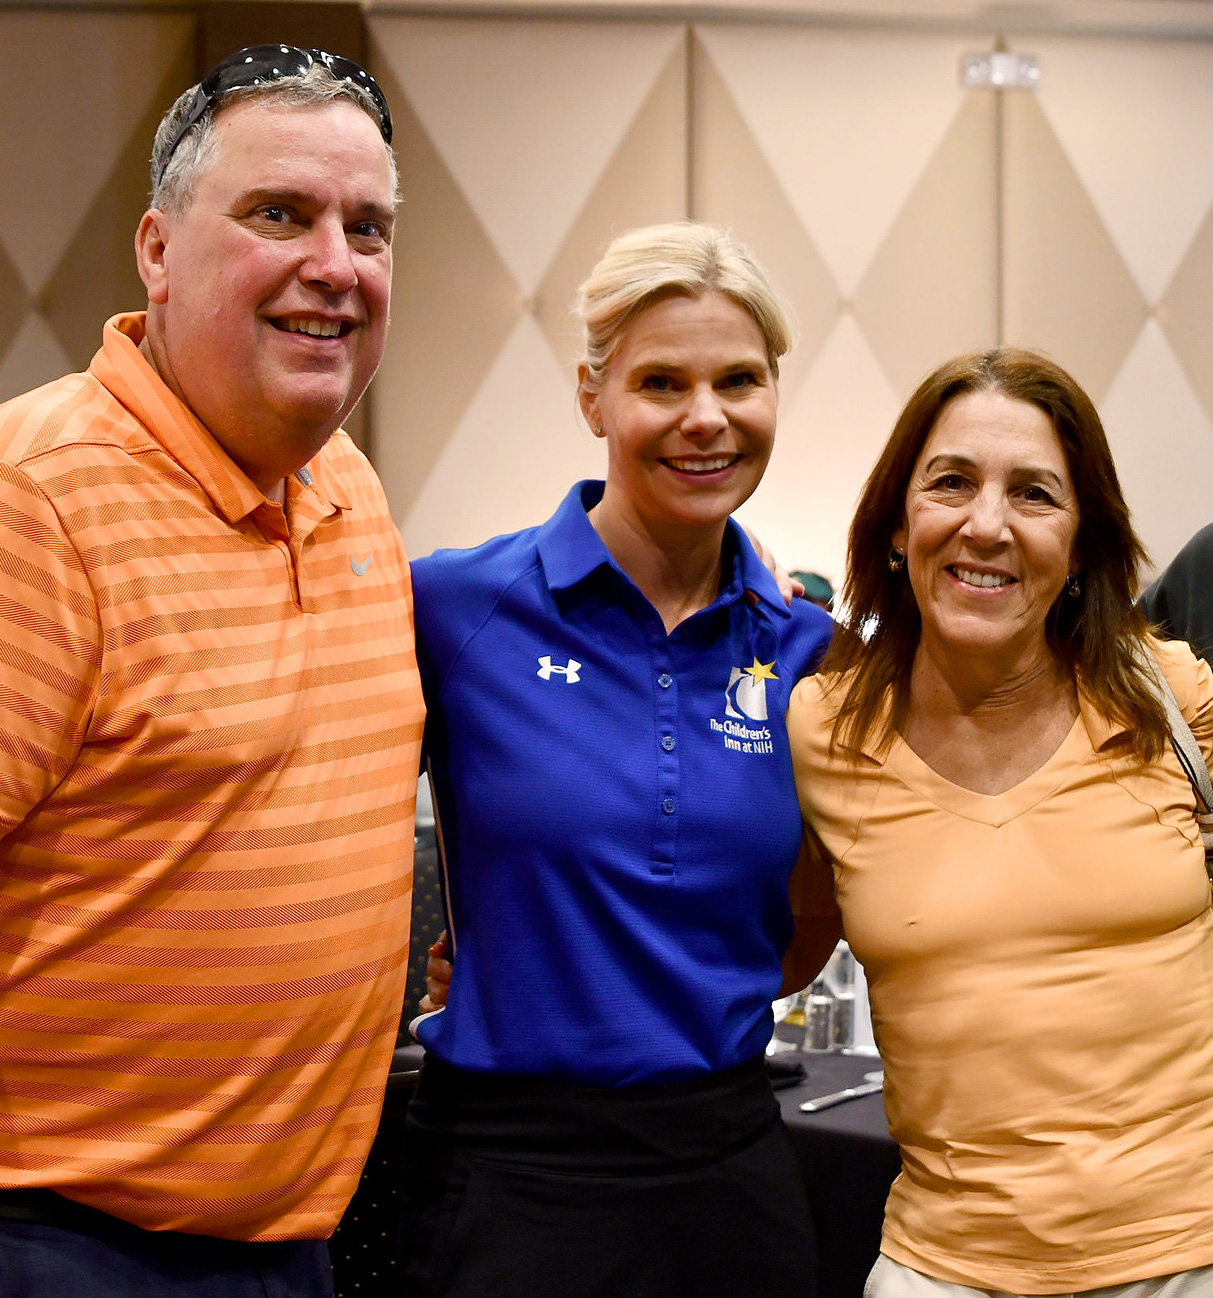 Phyllis, Scott, and Jennie at The Inn